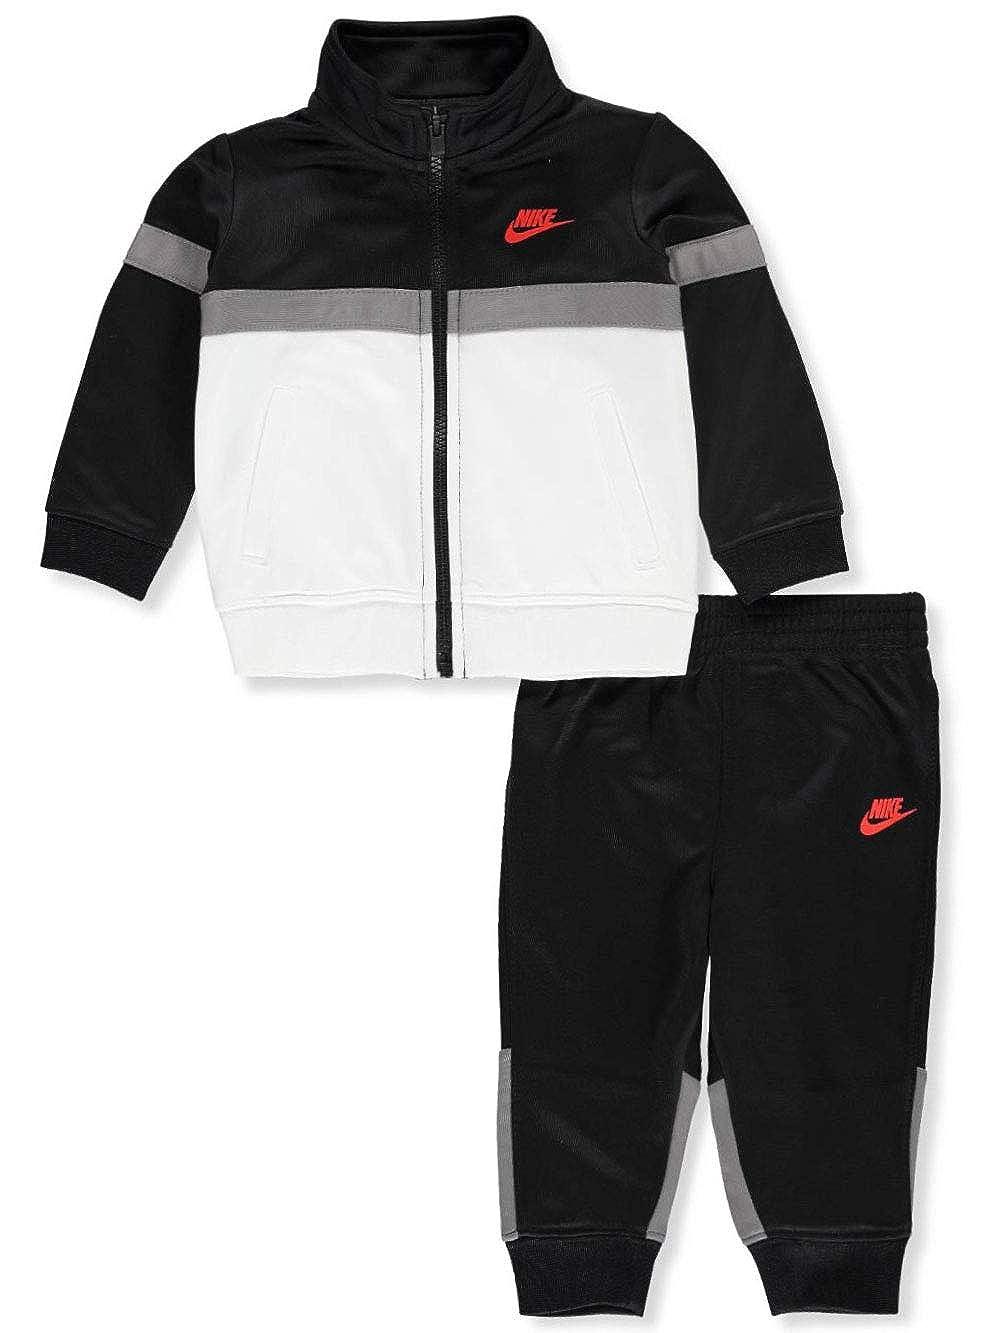 Nike - Chándal para niños (2 Piezas) - Negro - 6 Meses: Amazon.es ...